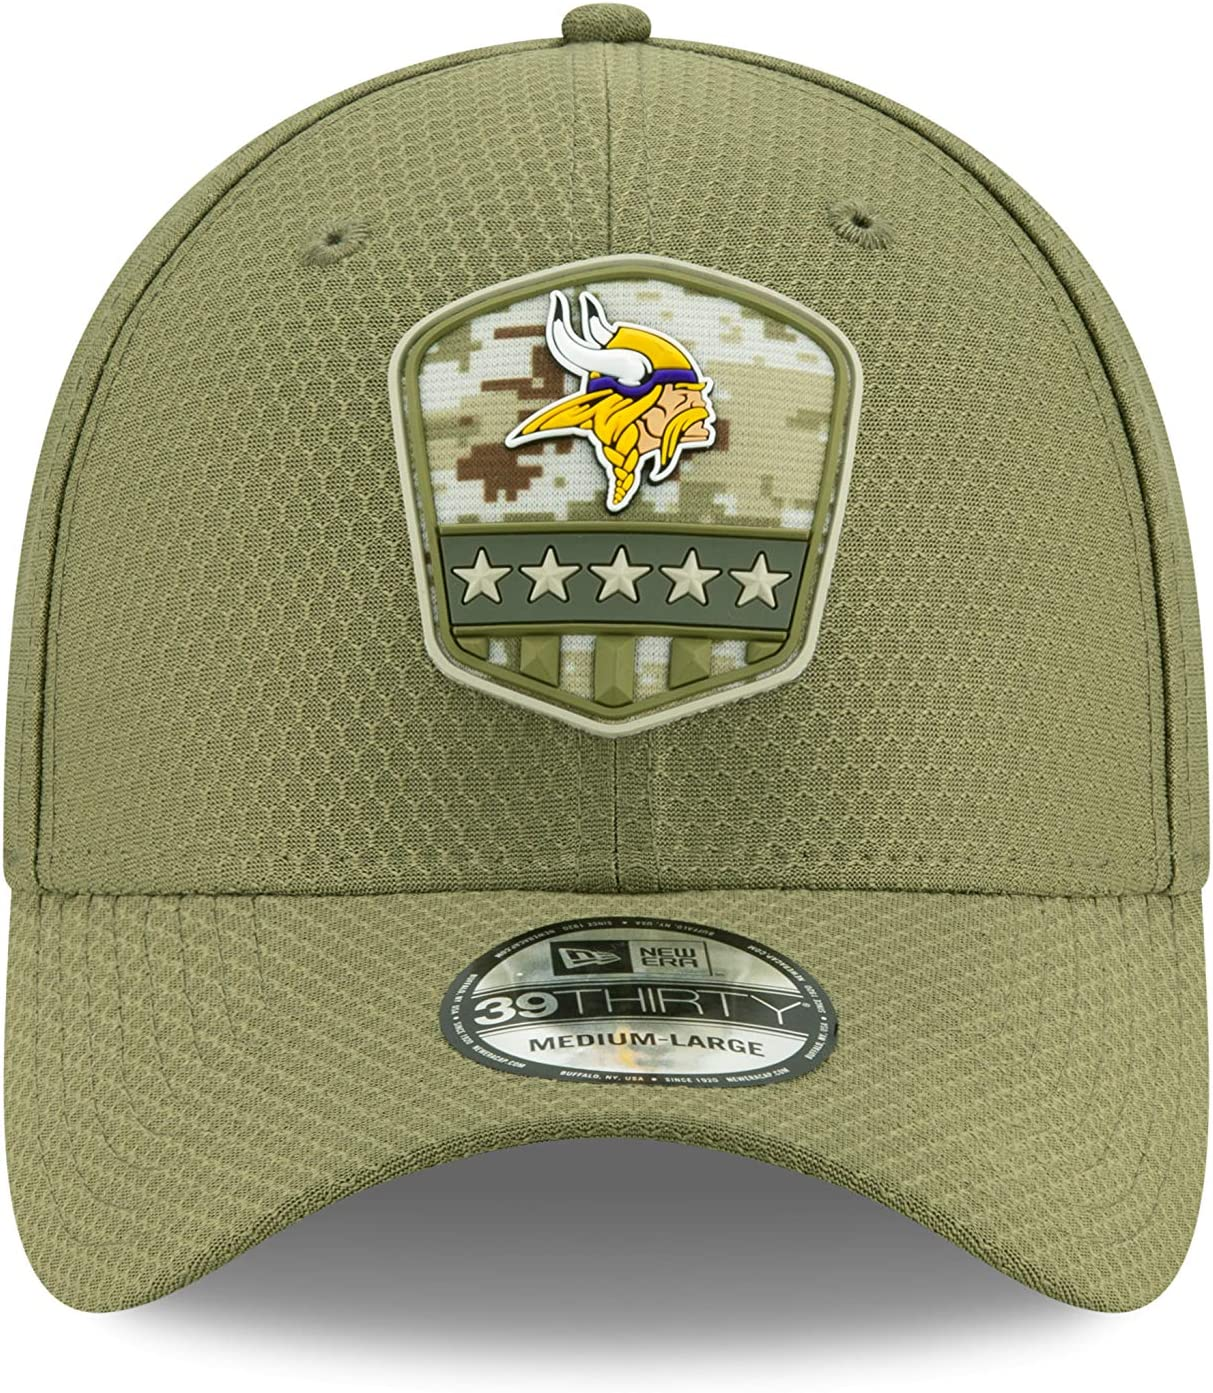 New Era Minnesota Vikings 39thirty Stretch Cap on Field 2019 Salute to Service